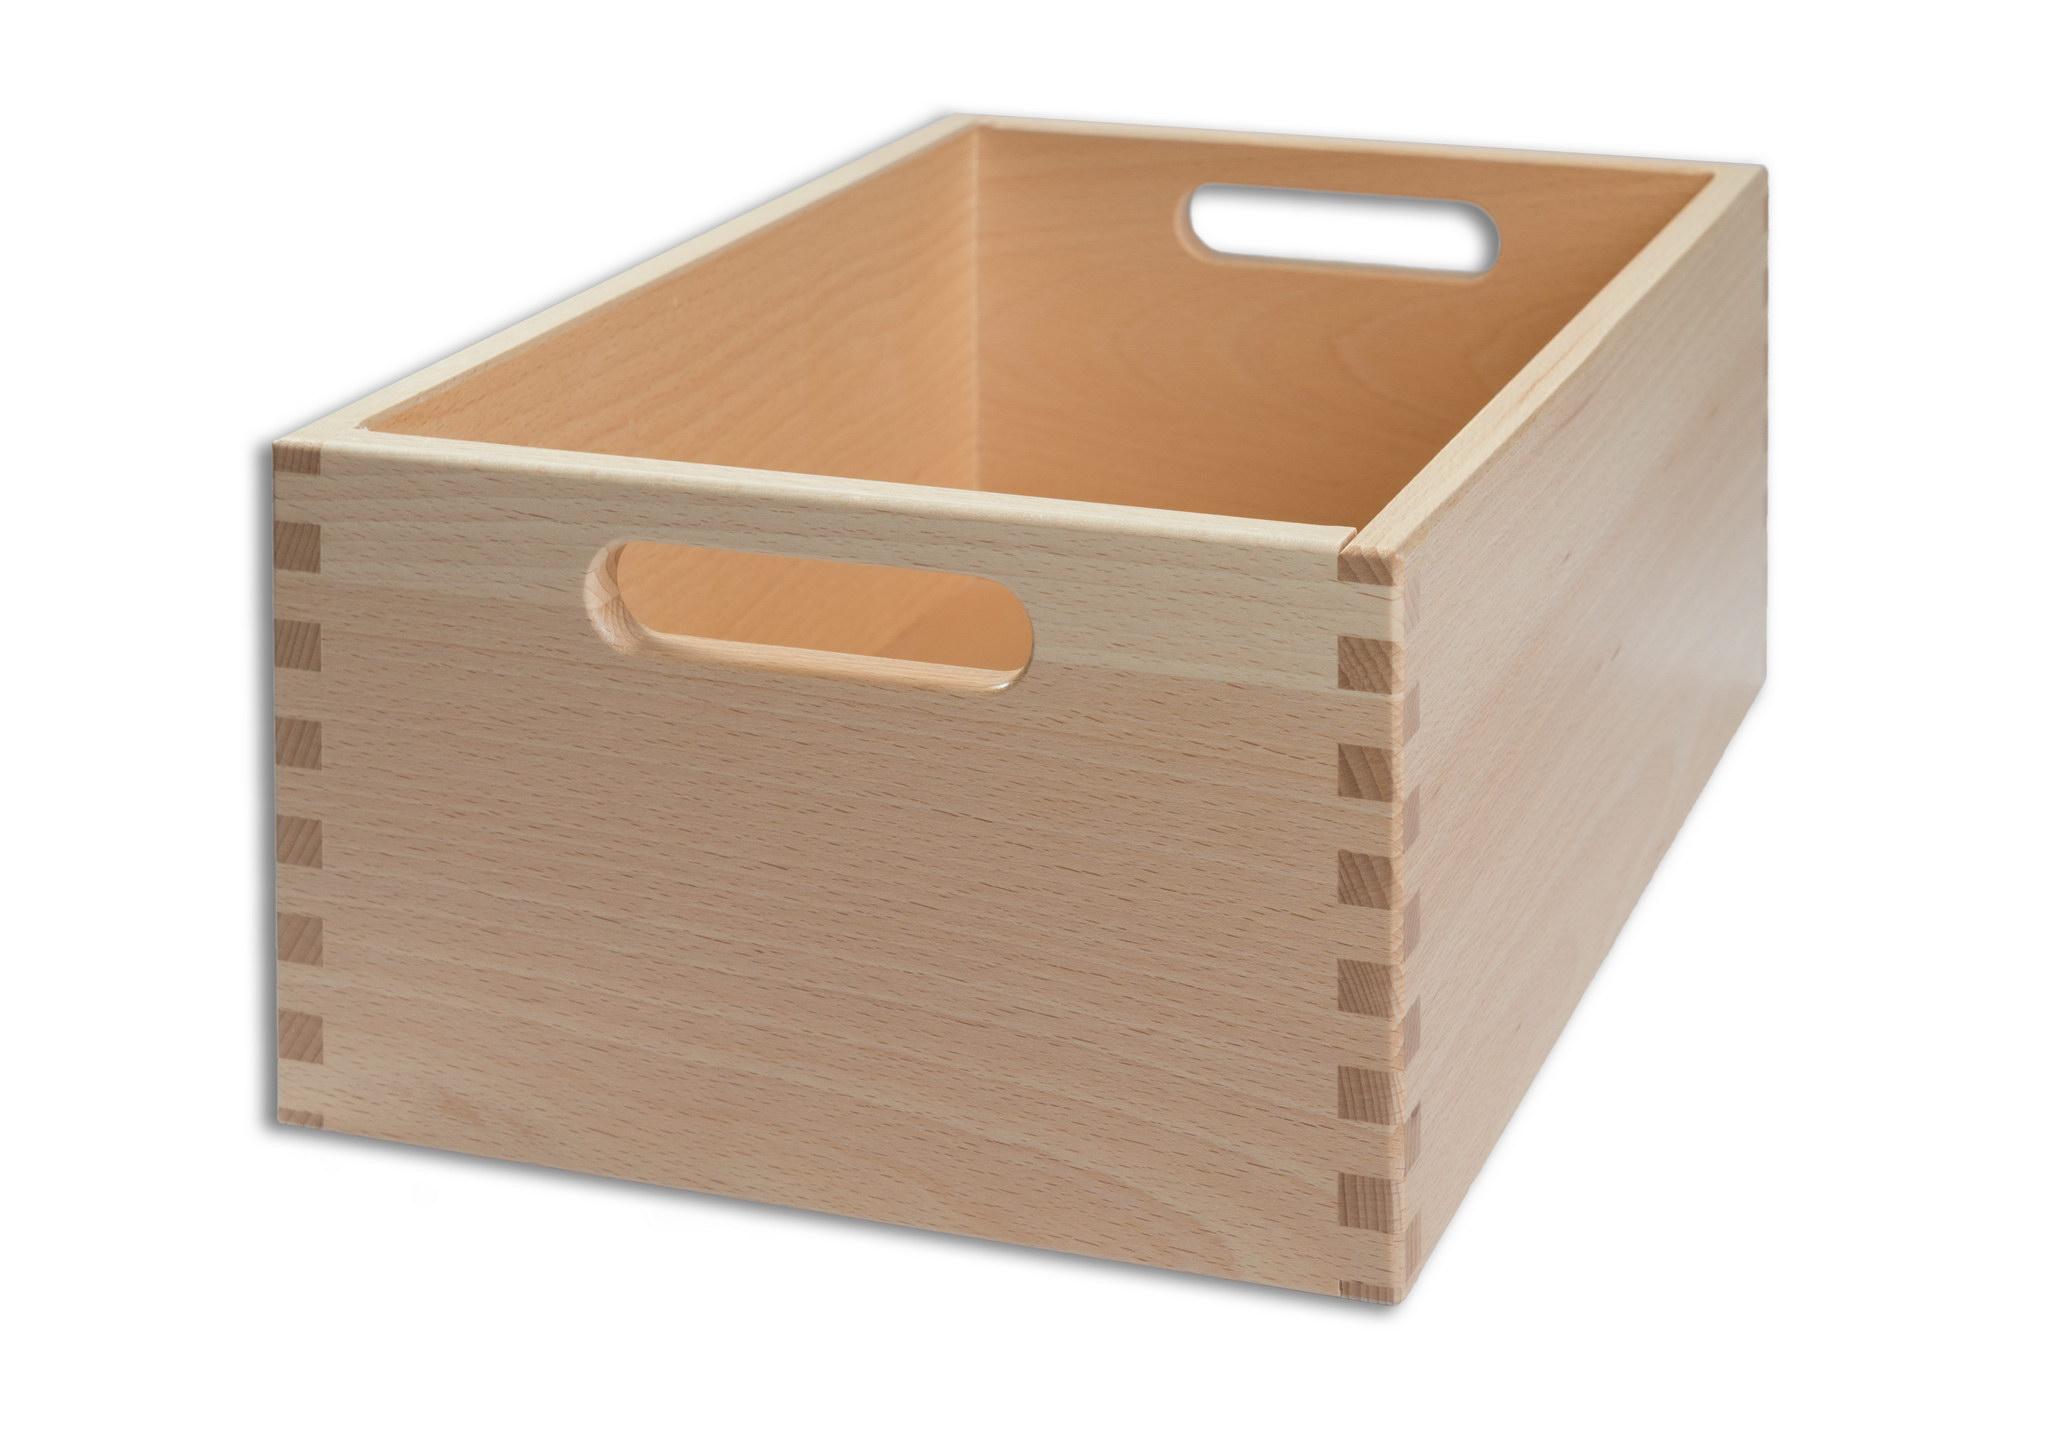 inspirierend spielzeugkiste aus holz selber bauen. Black Bedroom Furniture Sets. Home Design Ideas